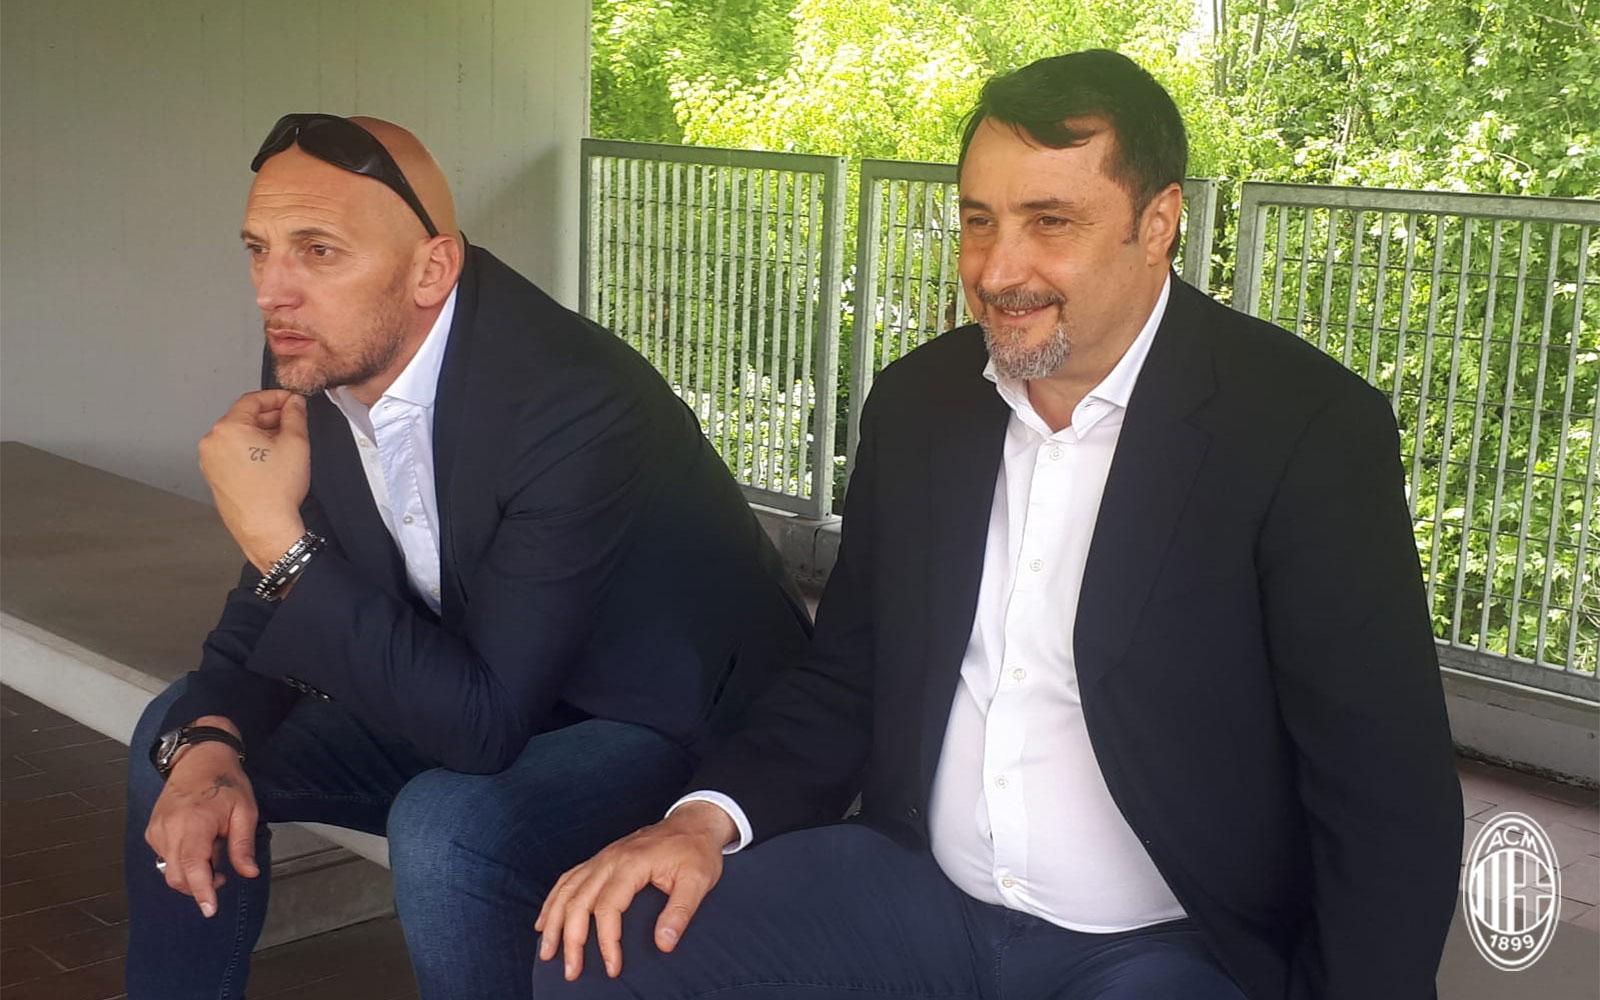 Christian Abbiati and Massimiliano Mirabelli watching a game. (@acmilan.com)